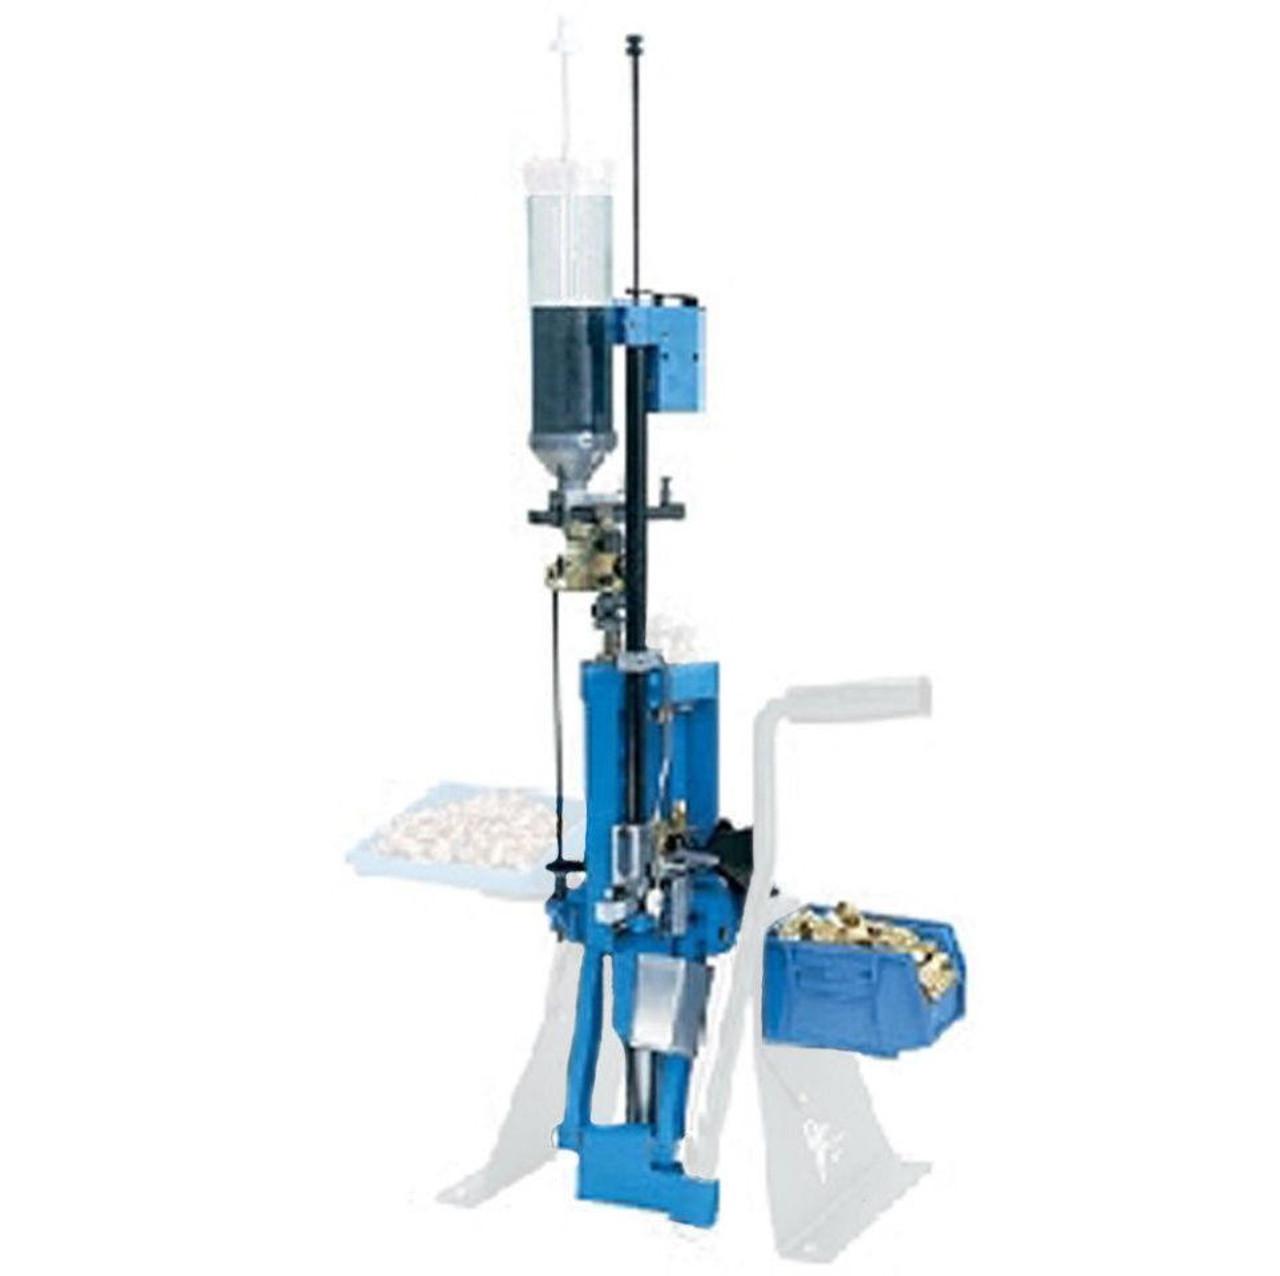 Dillon RL550C Reloading Machine (excludes caliber conversion kit)